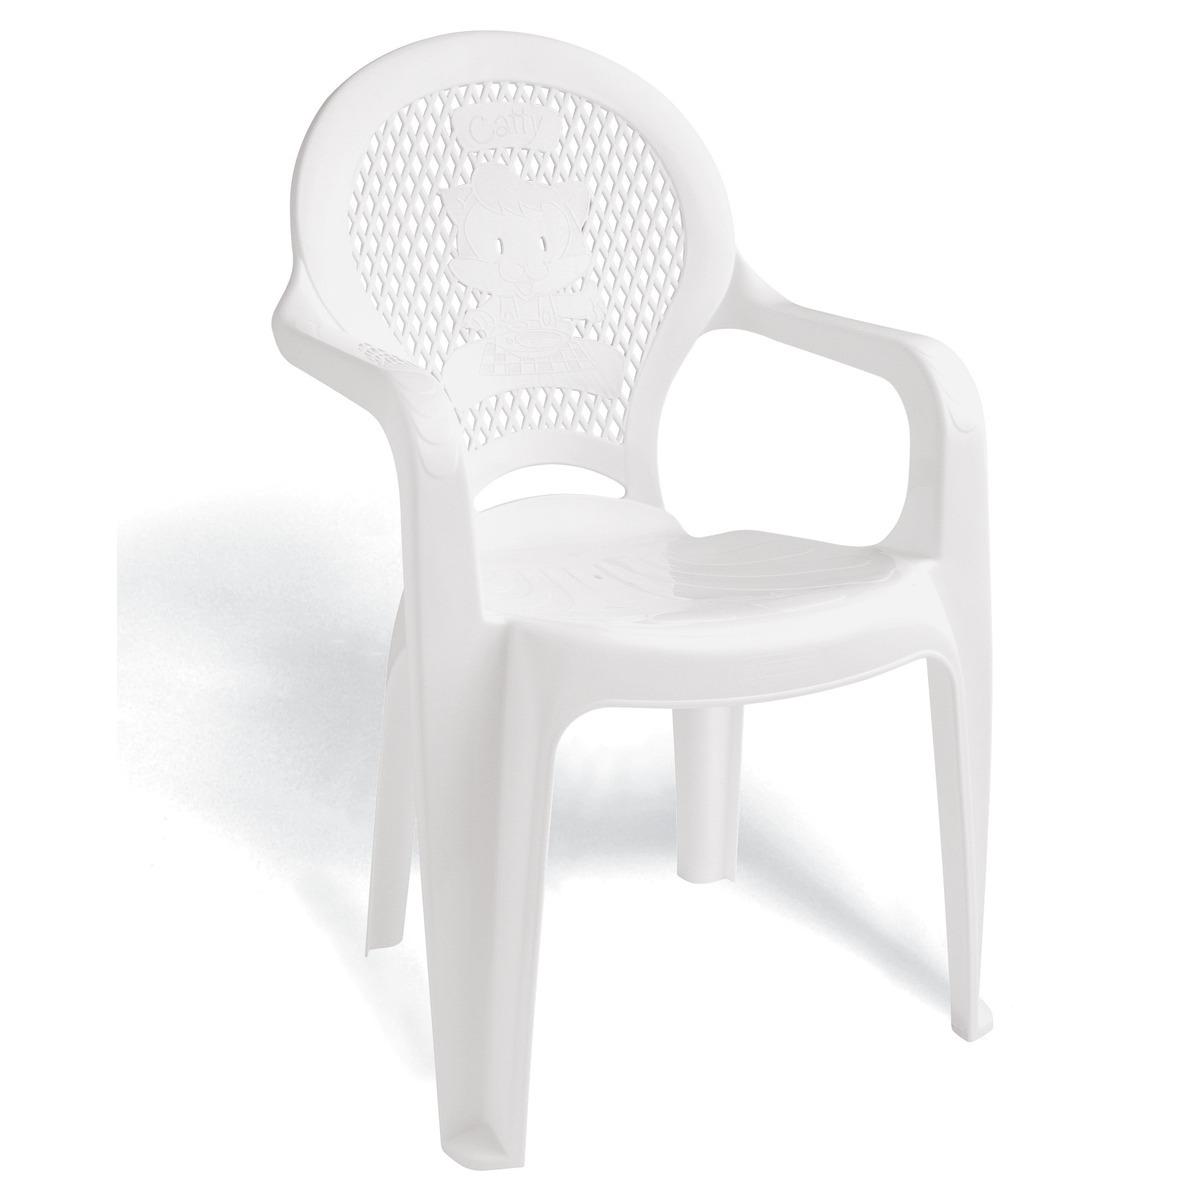 Poltrona Infantil de Plastico Estampada Branca 92264010 - Tramontina